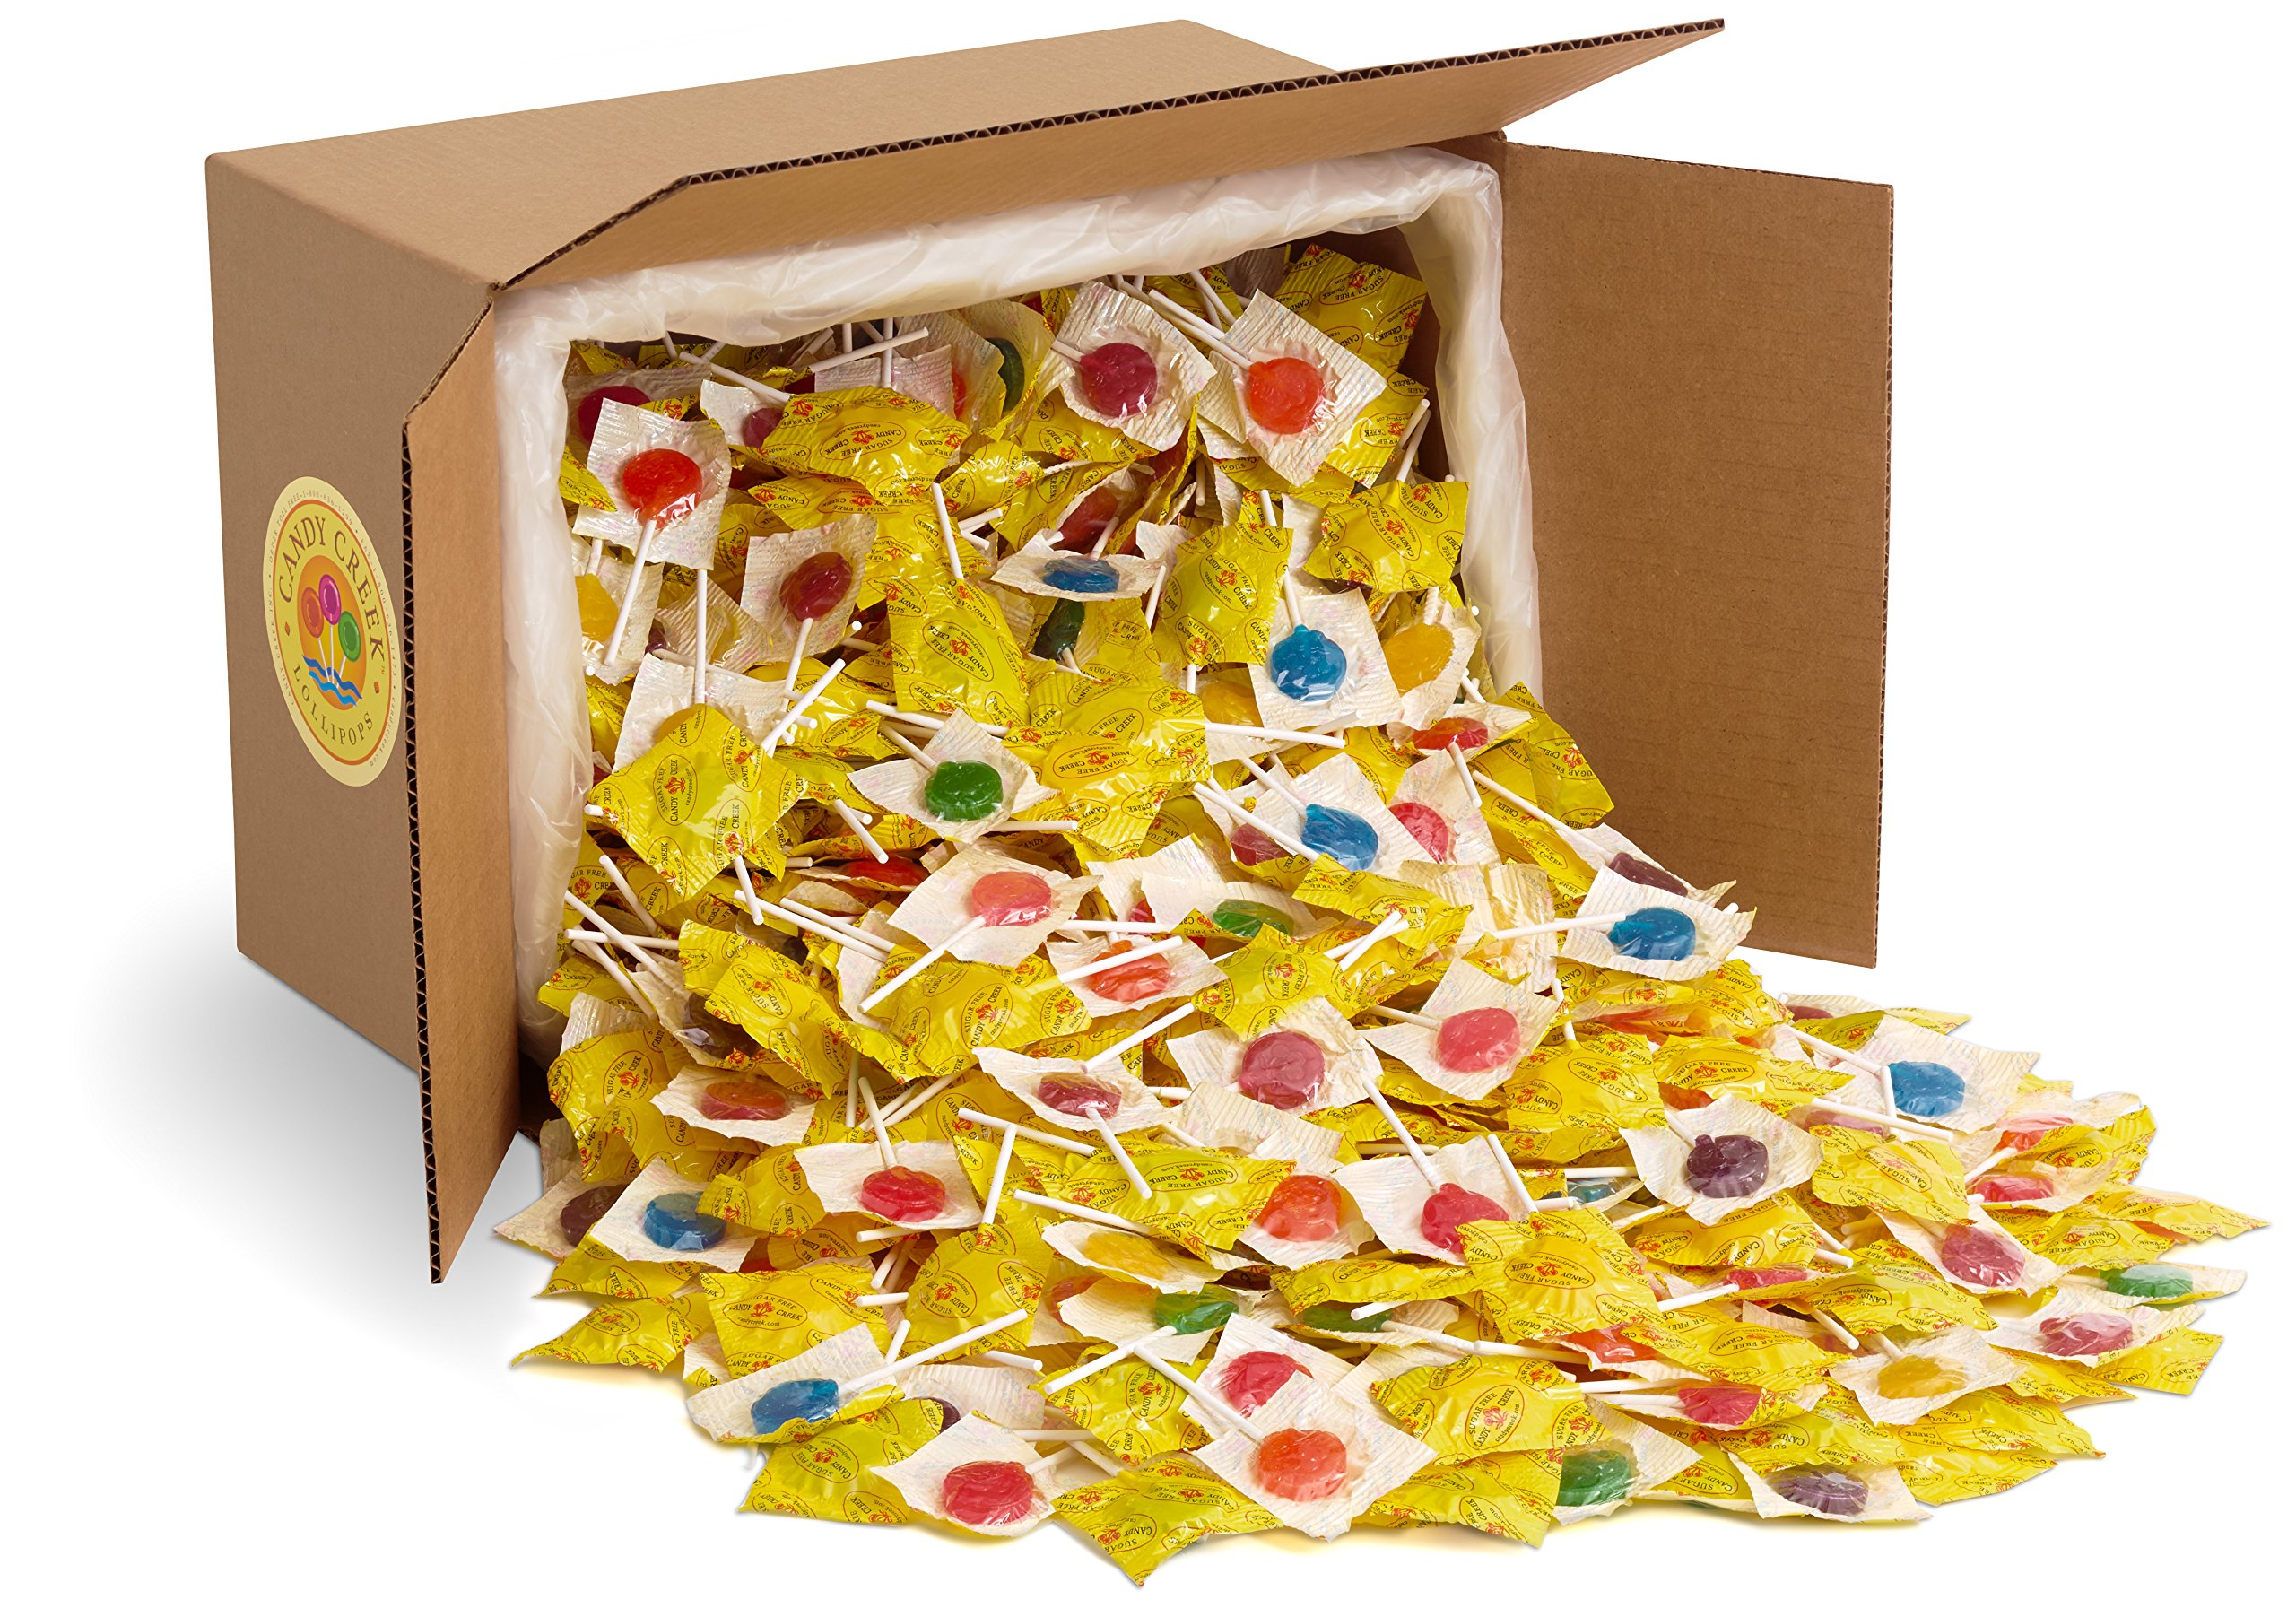 Sugar Free Fruit Lollipops by Candy Creek, Bulk 15 lb. Carton, Strawberry, Watermelon, Concord Grape, Blueberry Blast, Lemonaid, Tangerine, Red Raspberry, and Sour Apple by Candy Creek Lollipops